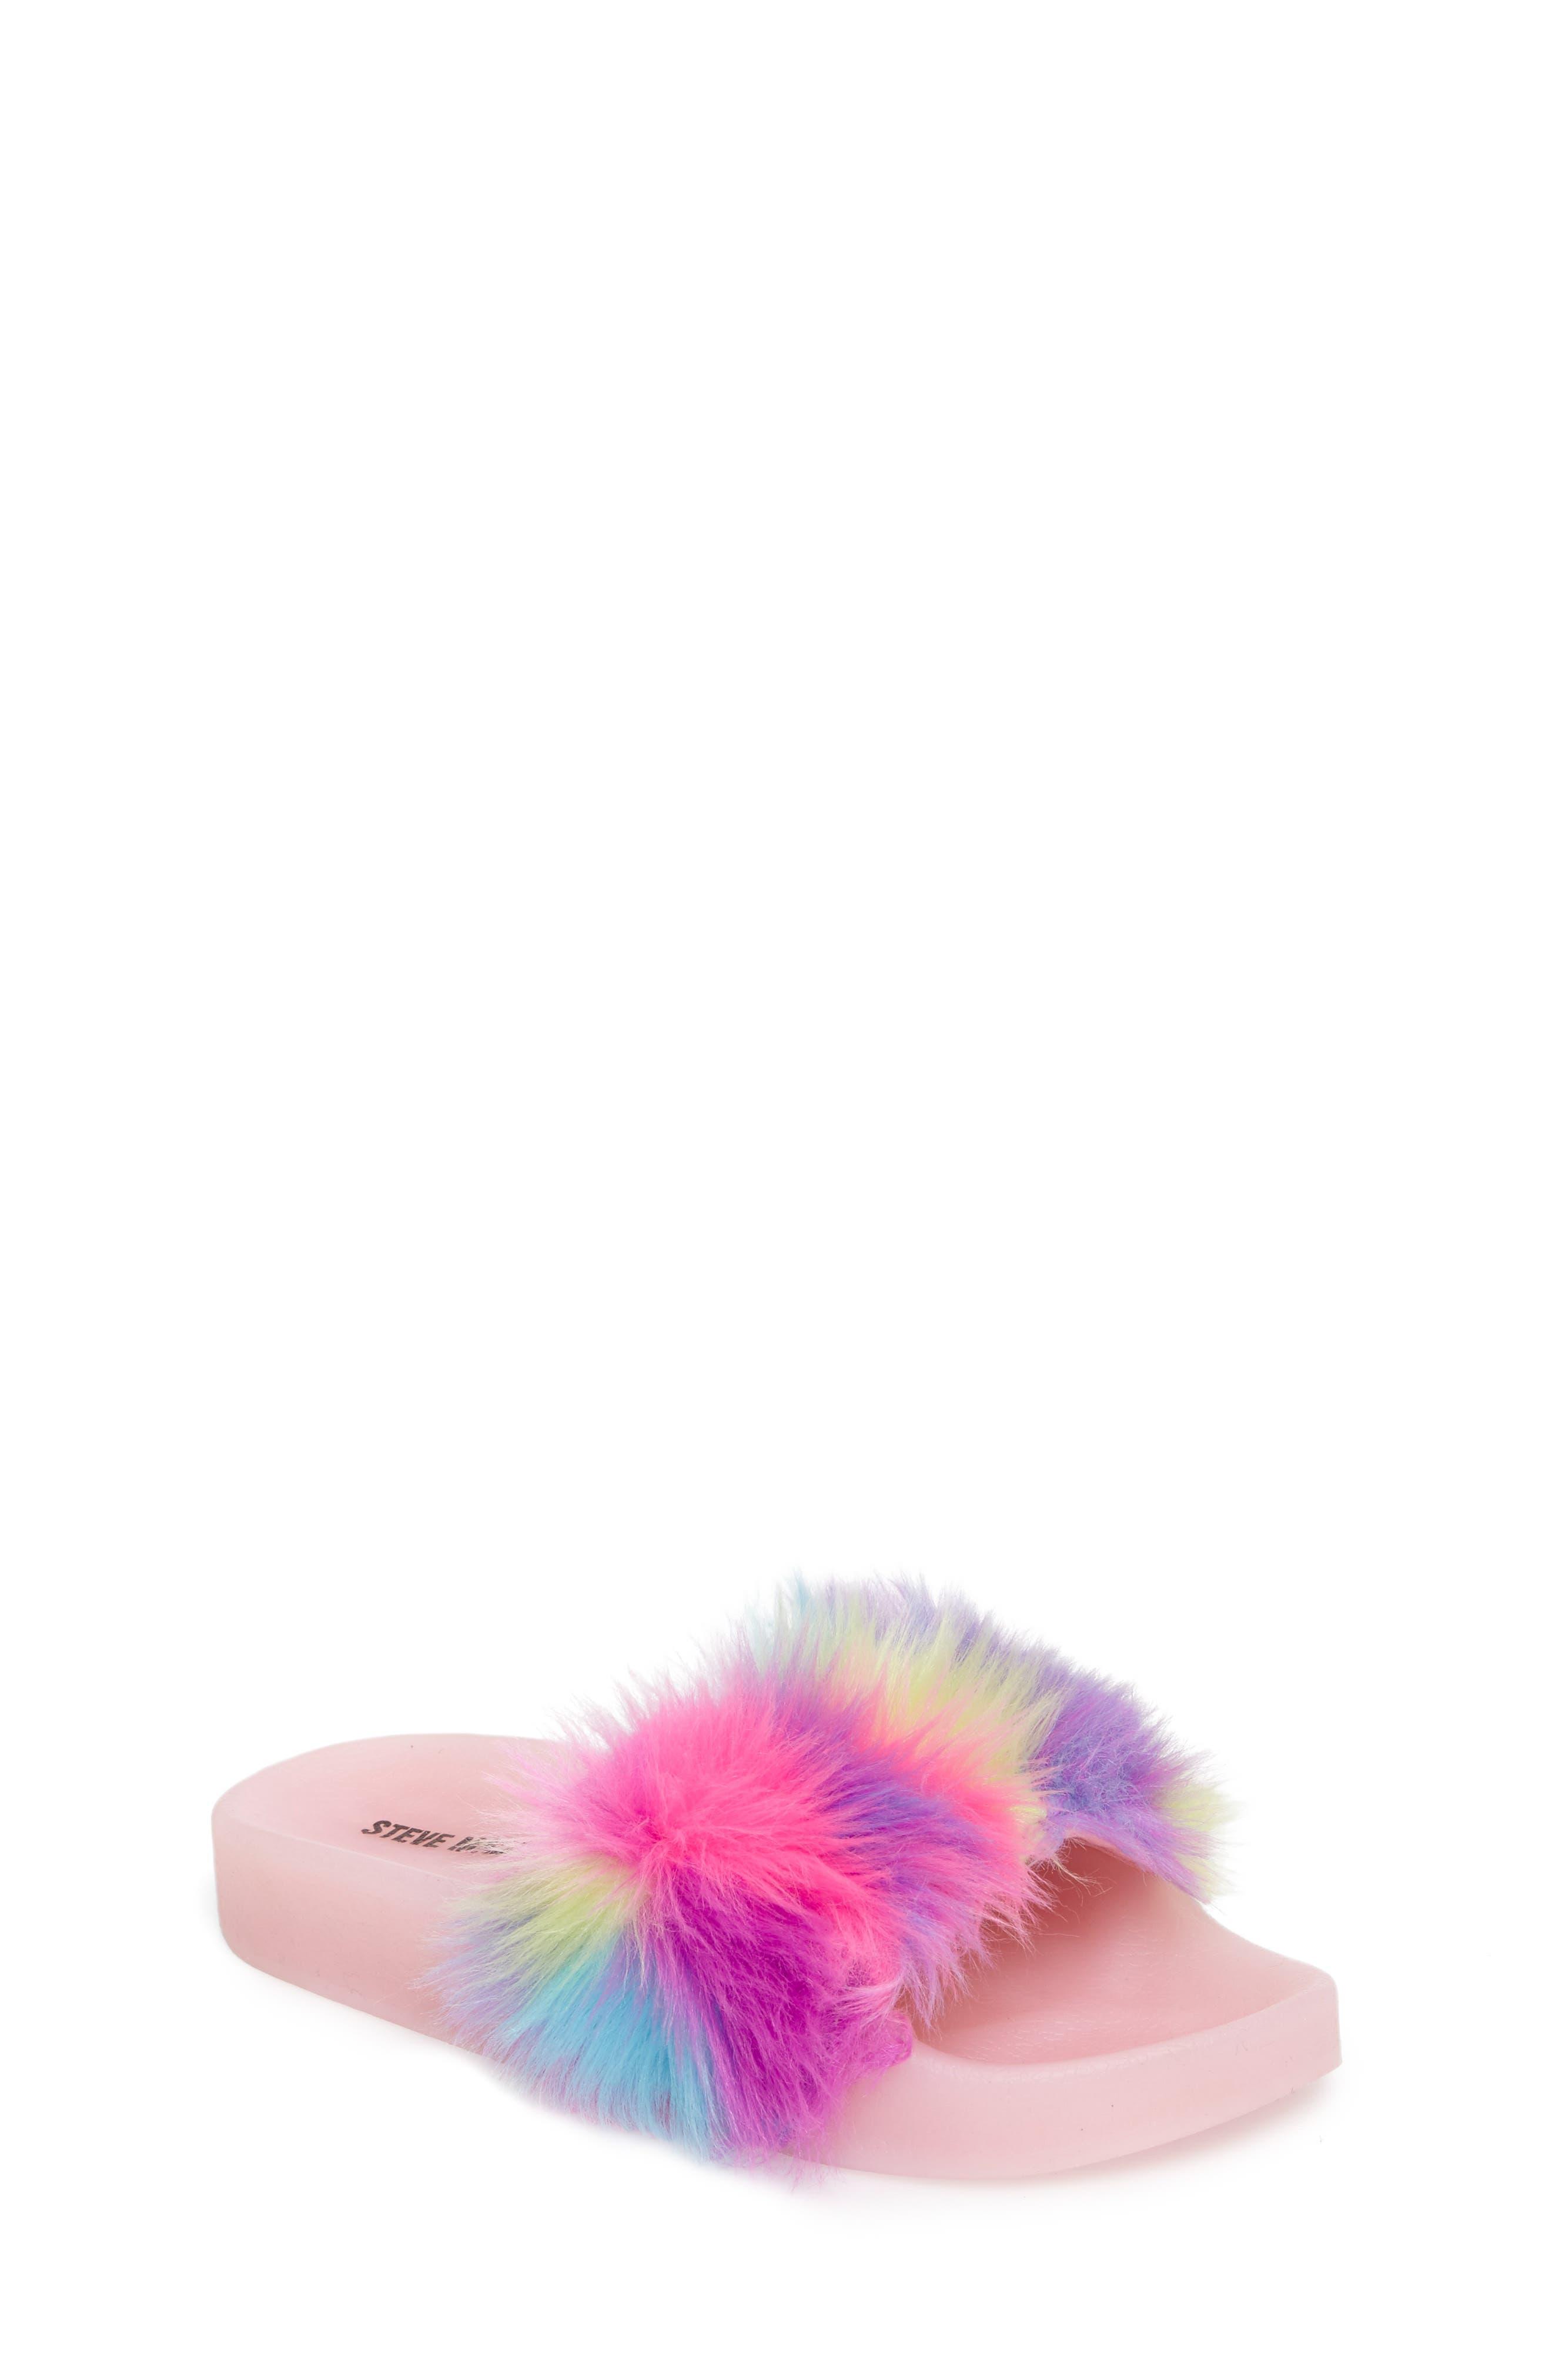 Jlights Faux Fur Light-Up Slide Sandal,                         Main,                         color, Multi